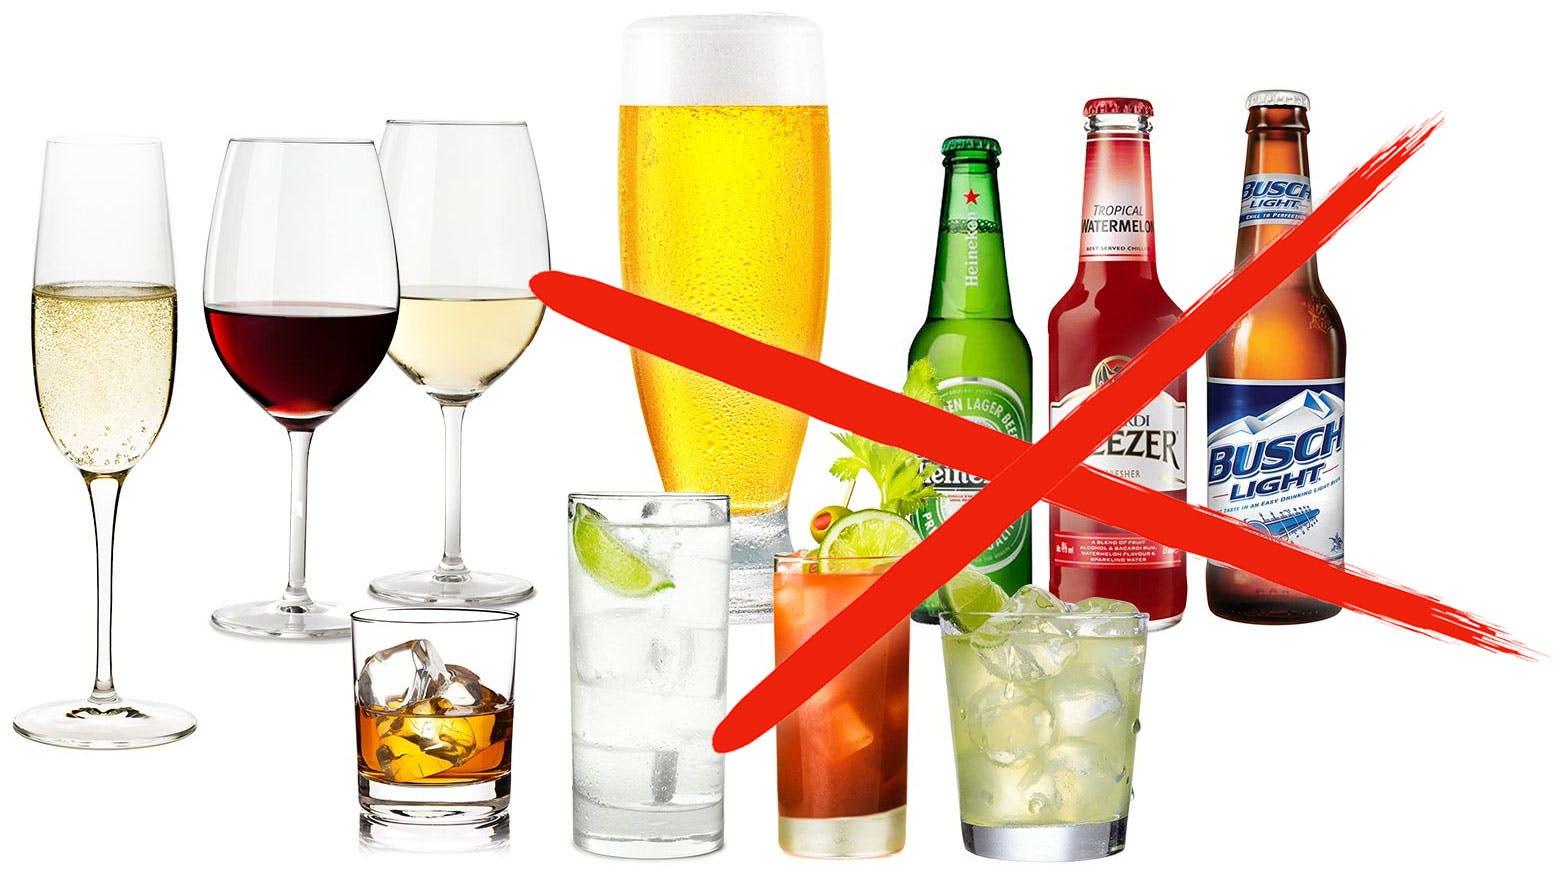 KetoAlcohol